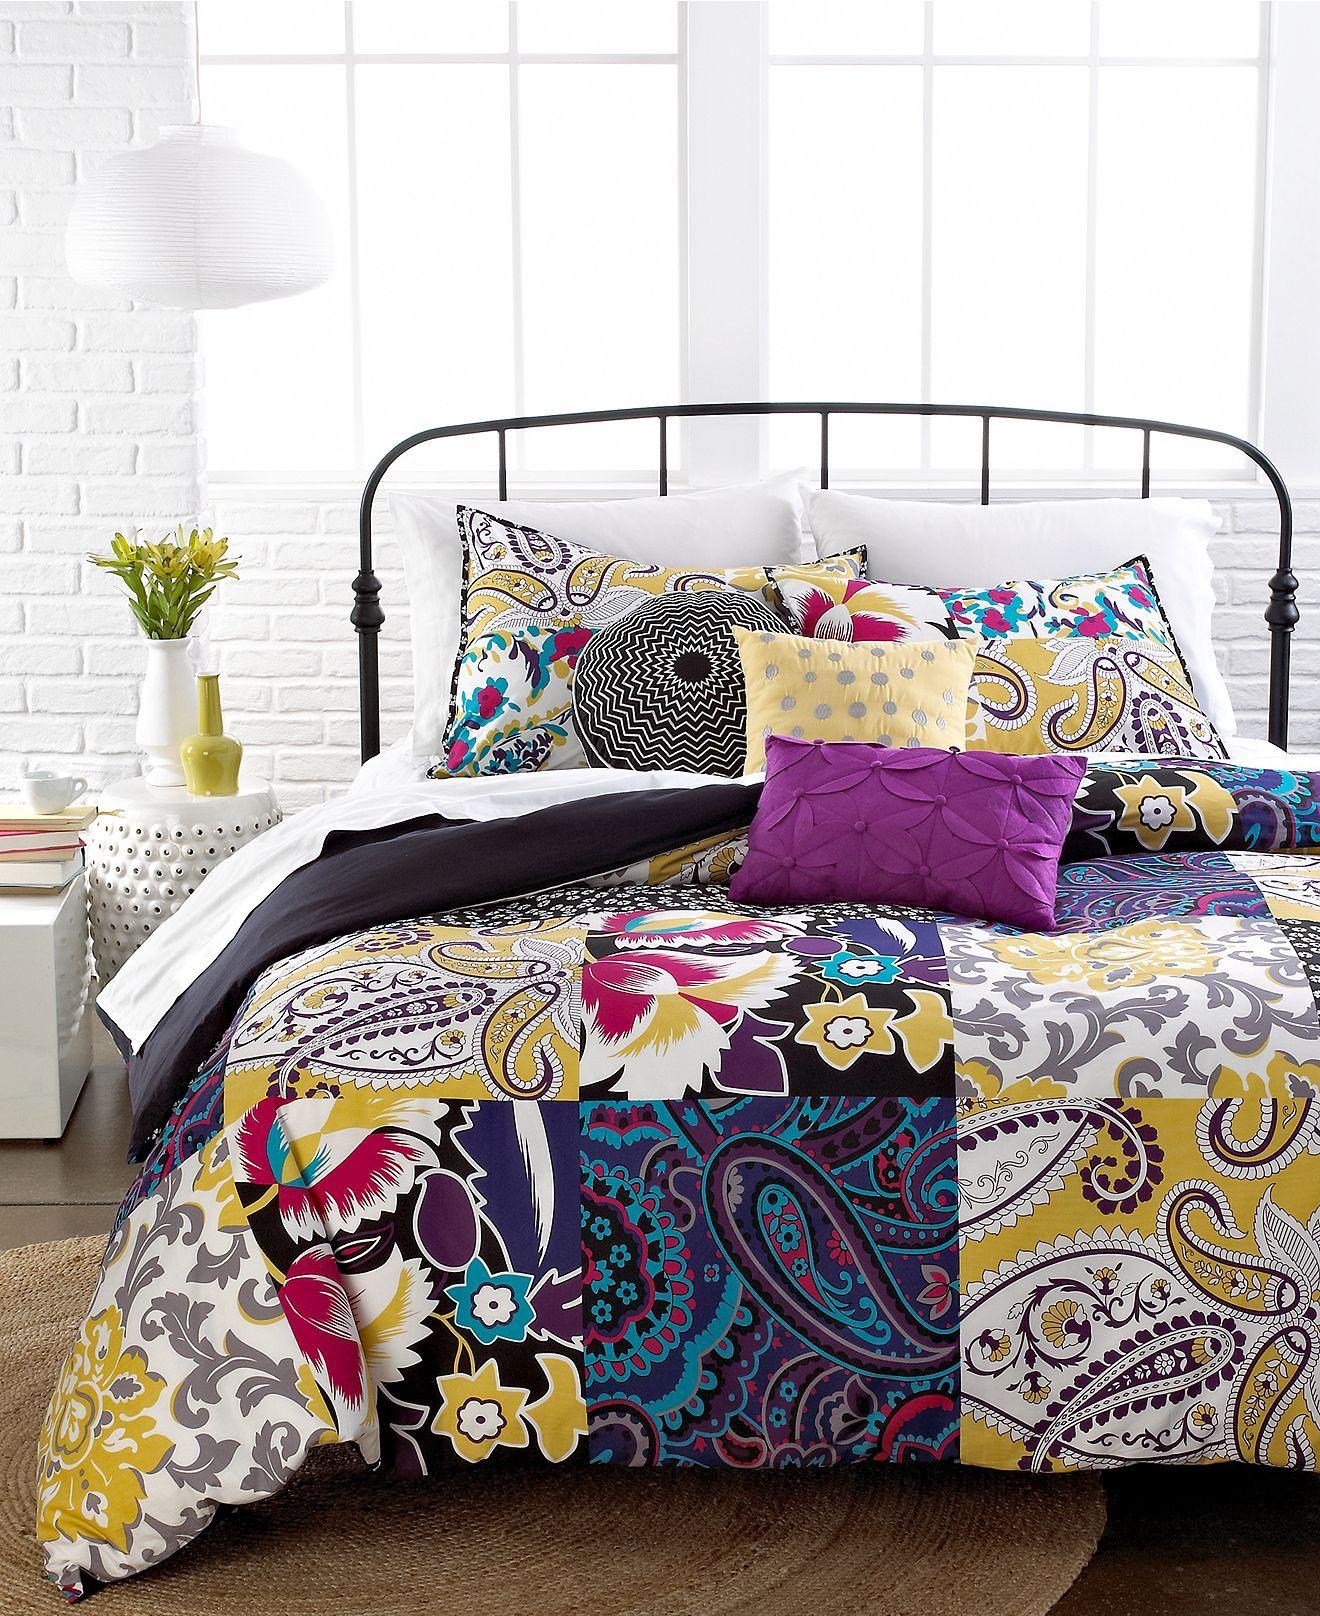 Sunshine Patchwork 3 Piece Duvet Cover Sets Duvet Covers Bed